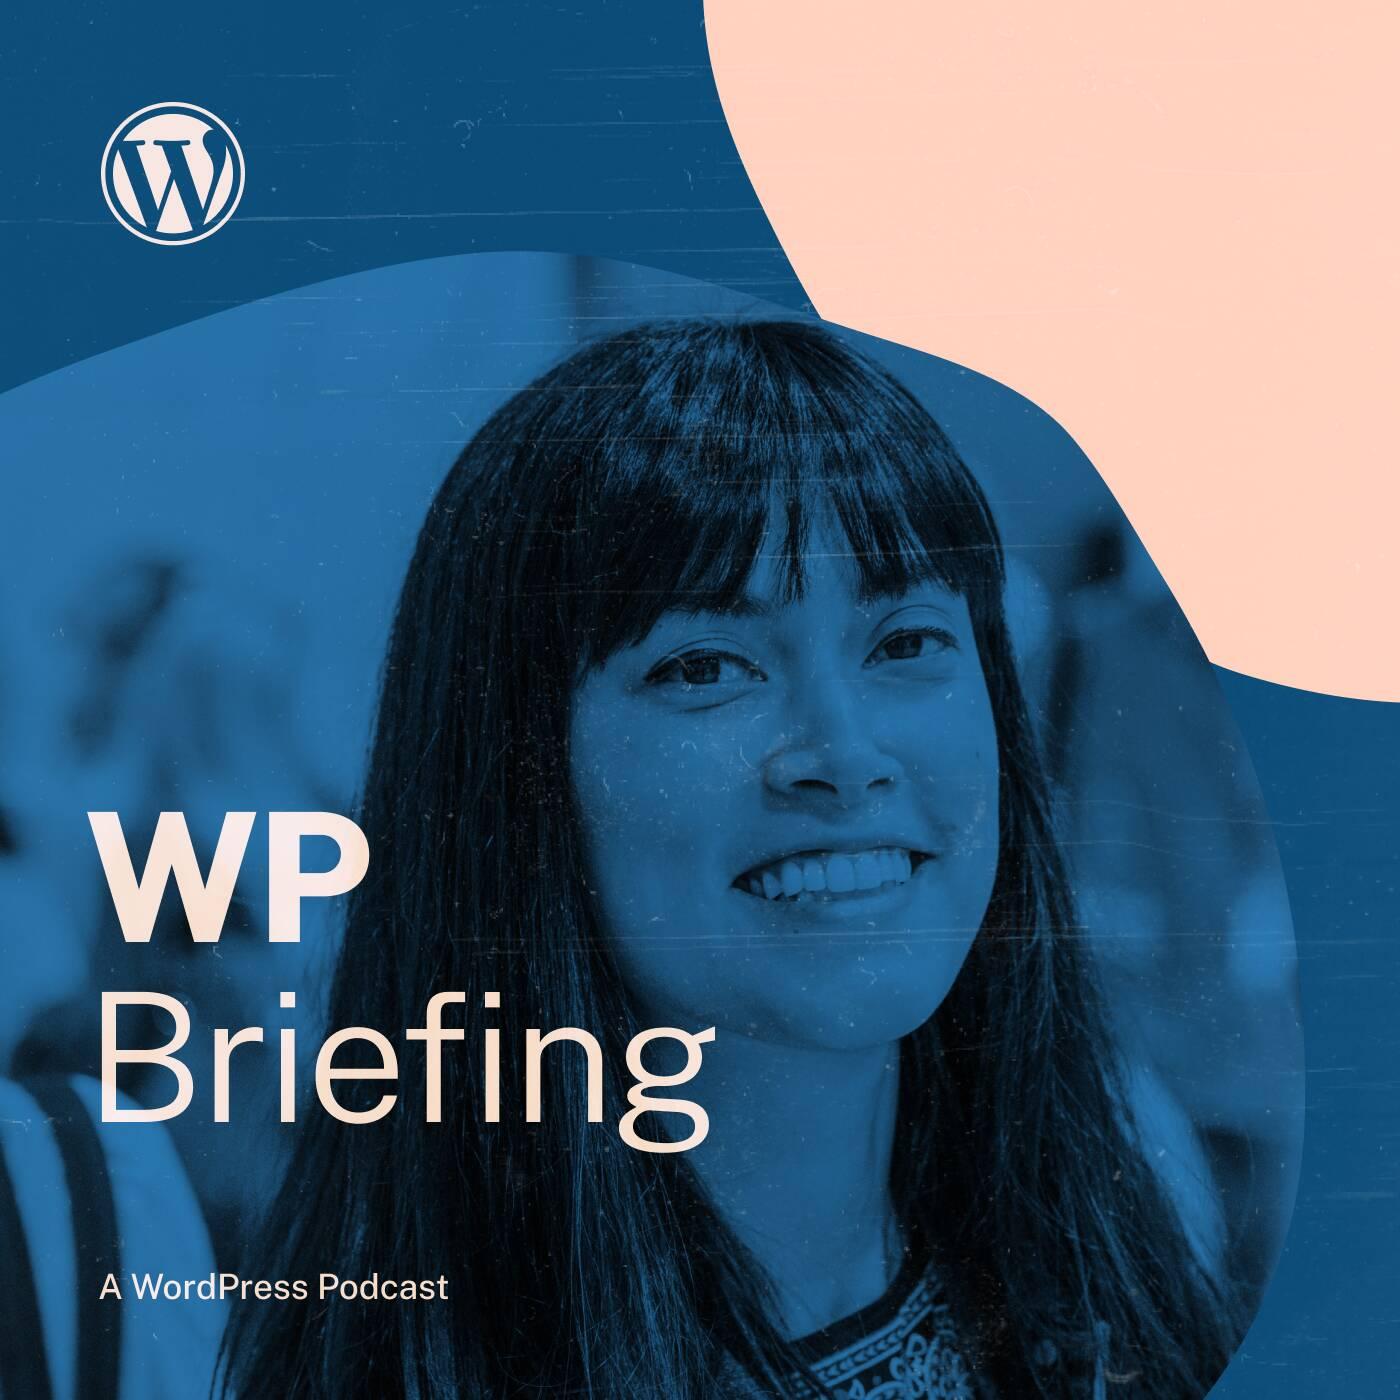 Episode 13: Cherishing WordPress Diversity